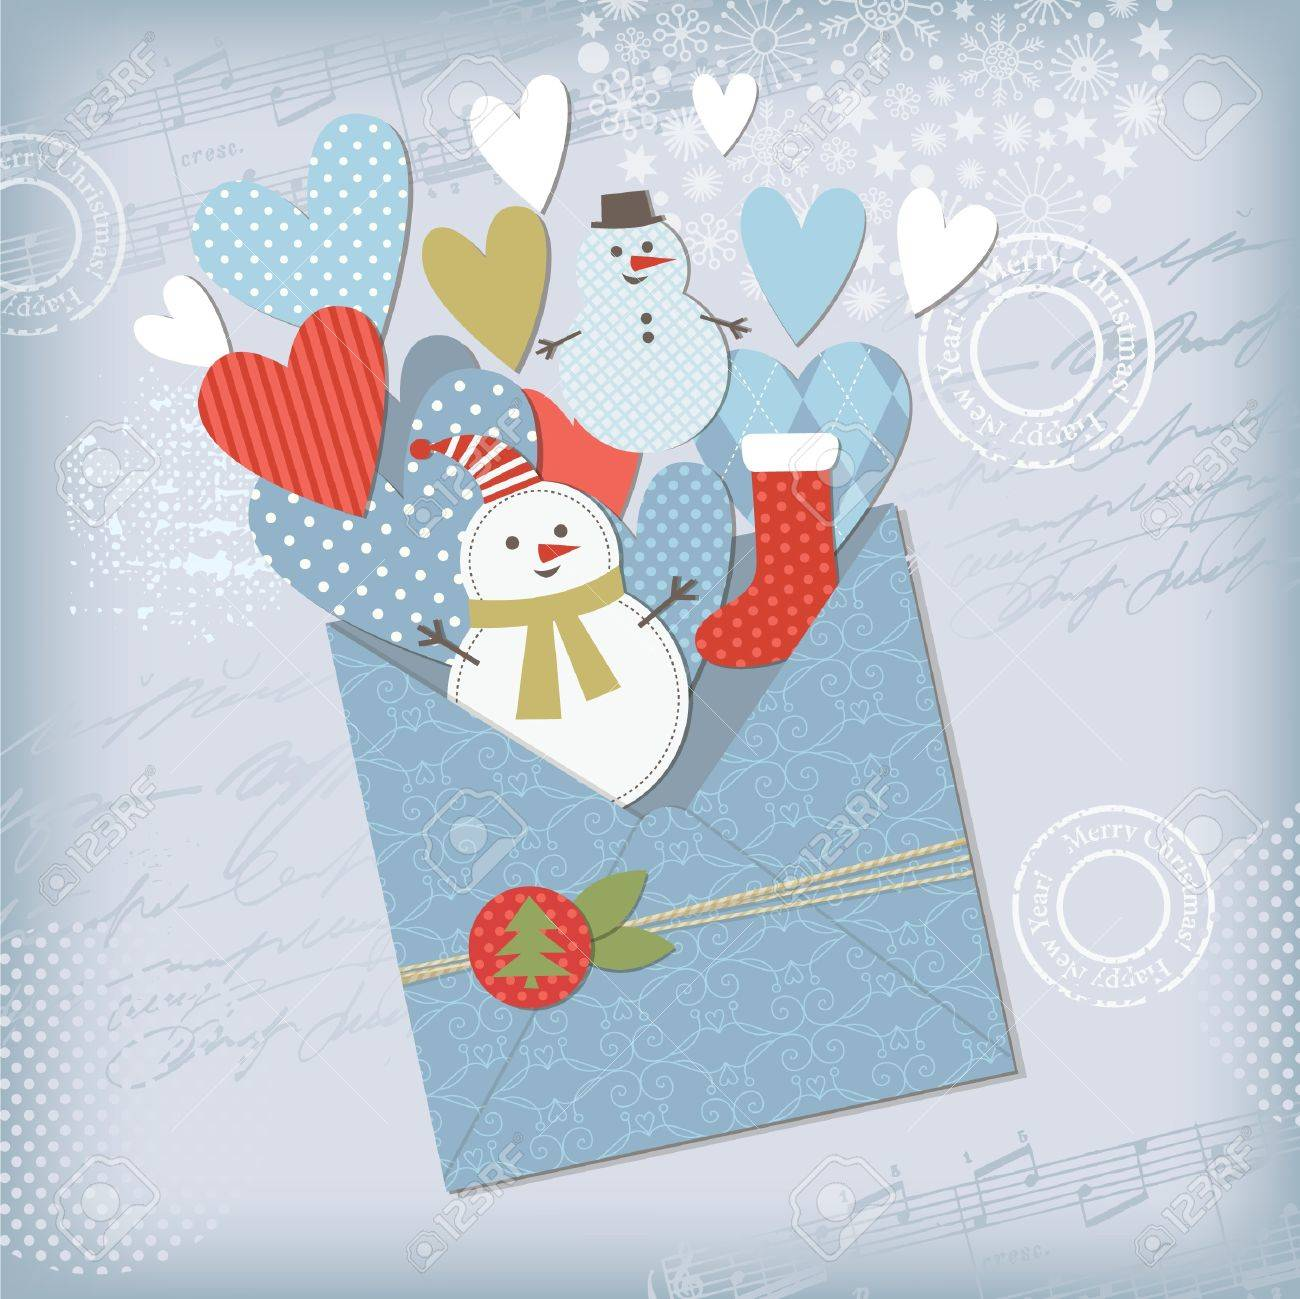 Seasons Greetings Stock Vector - 11213558